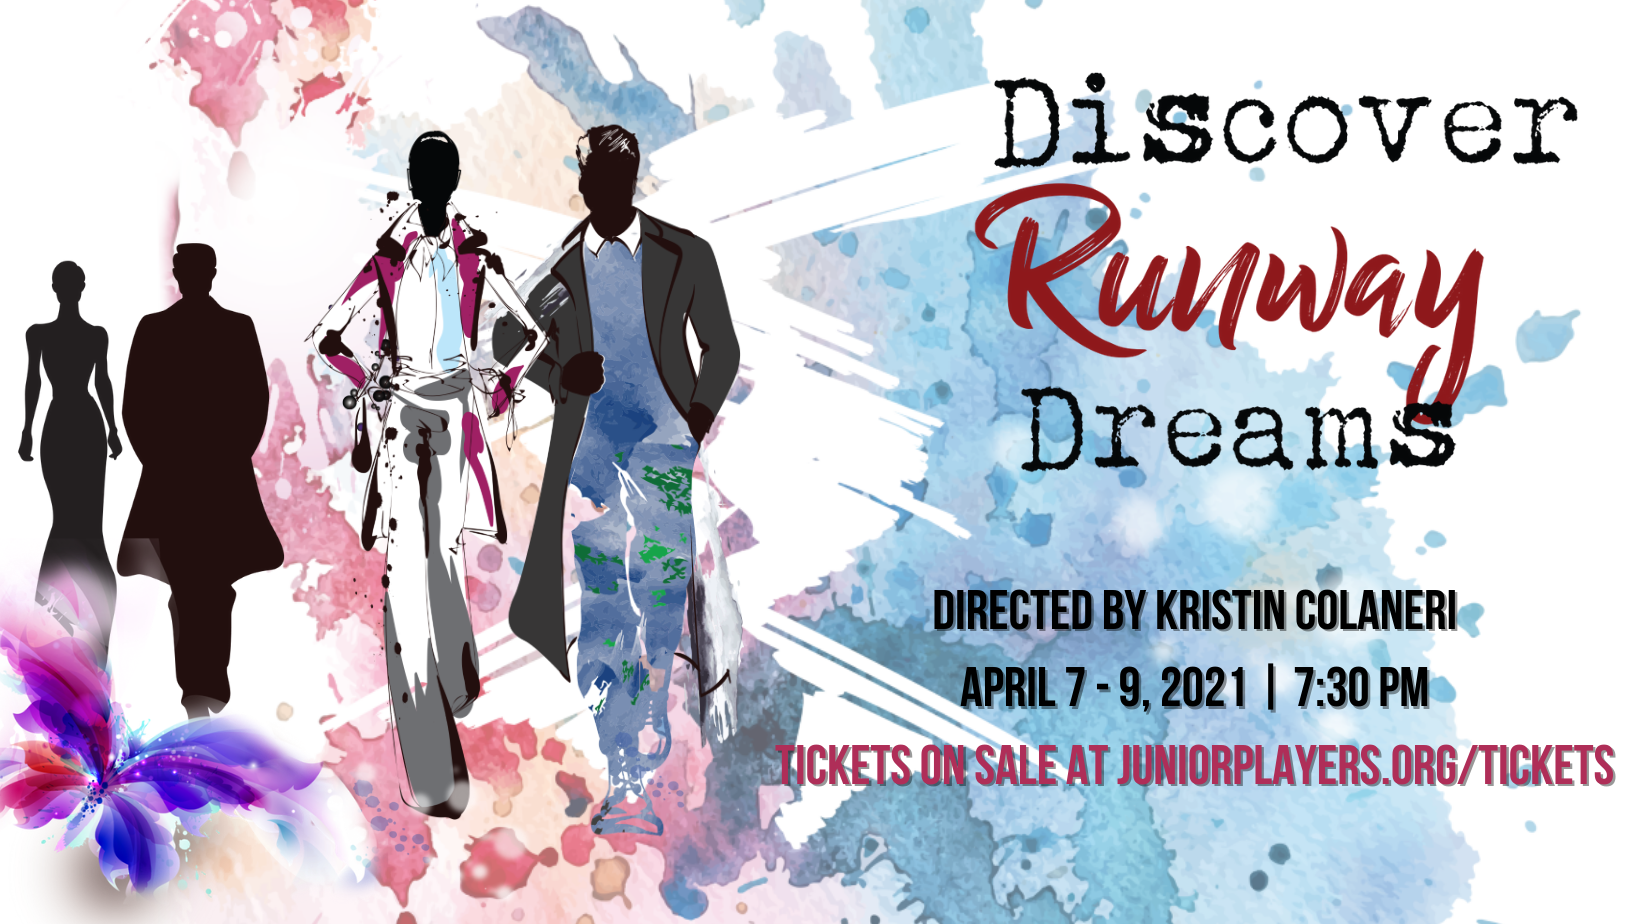 Discover Runway Dreams 2021 Press Release